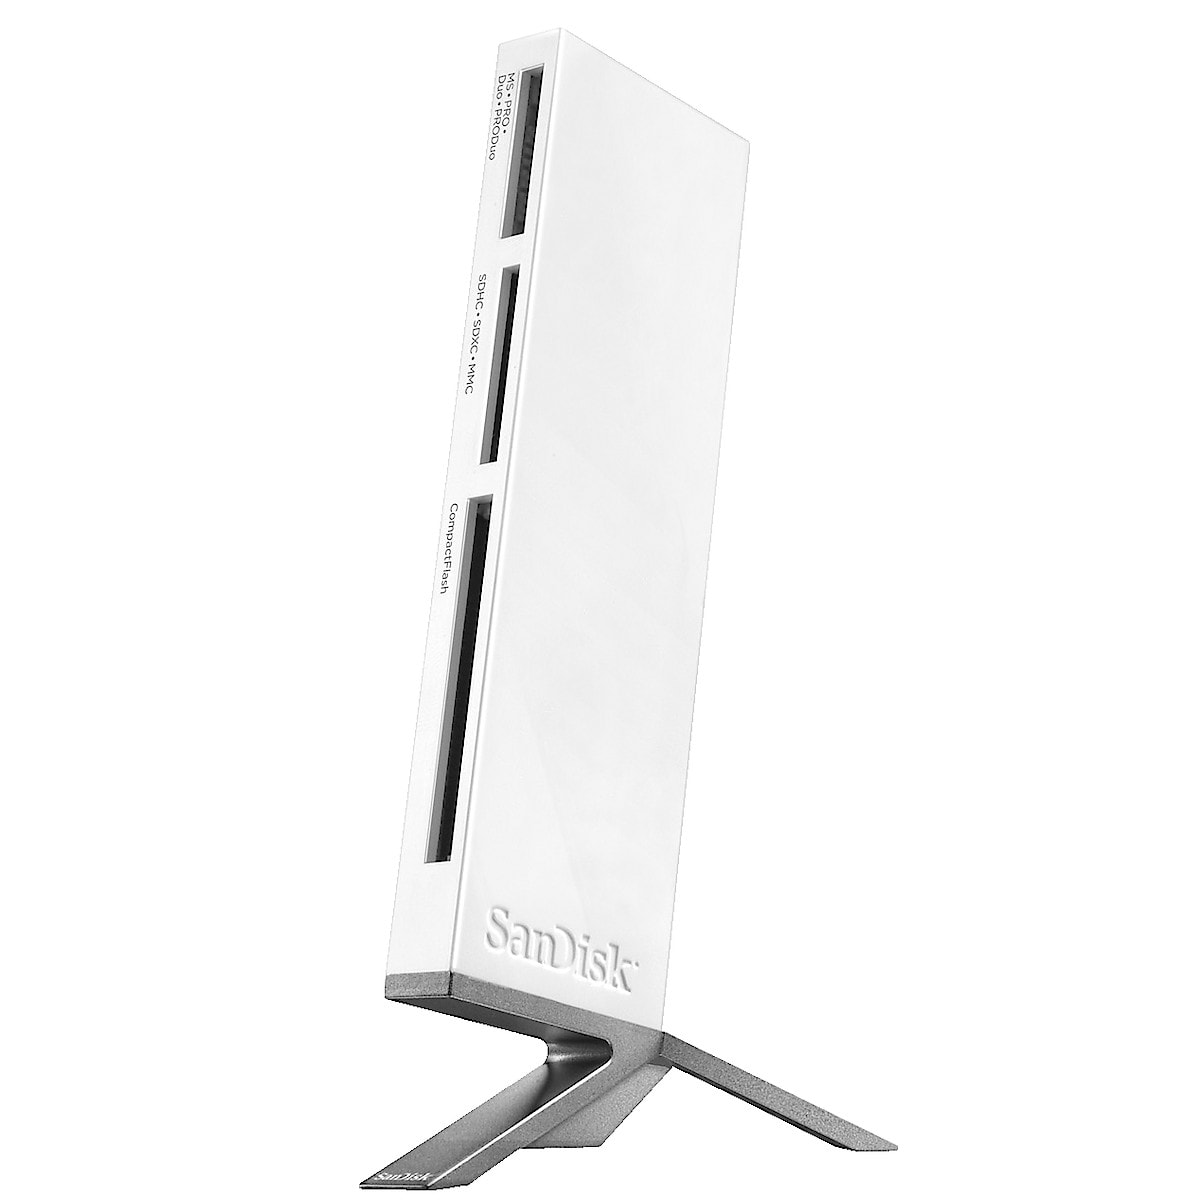 Sandisk ImageMate Reader USB 3.0 minnekortleser